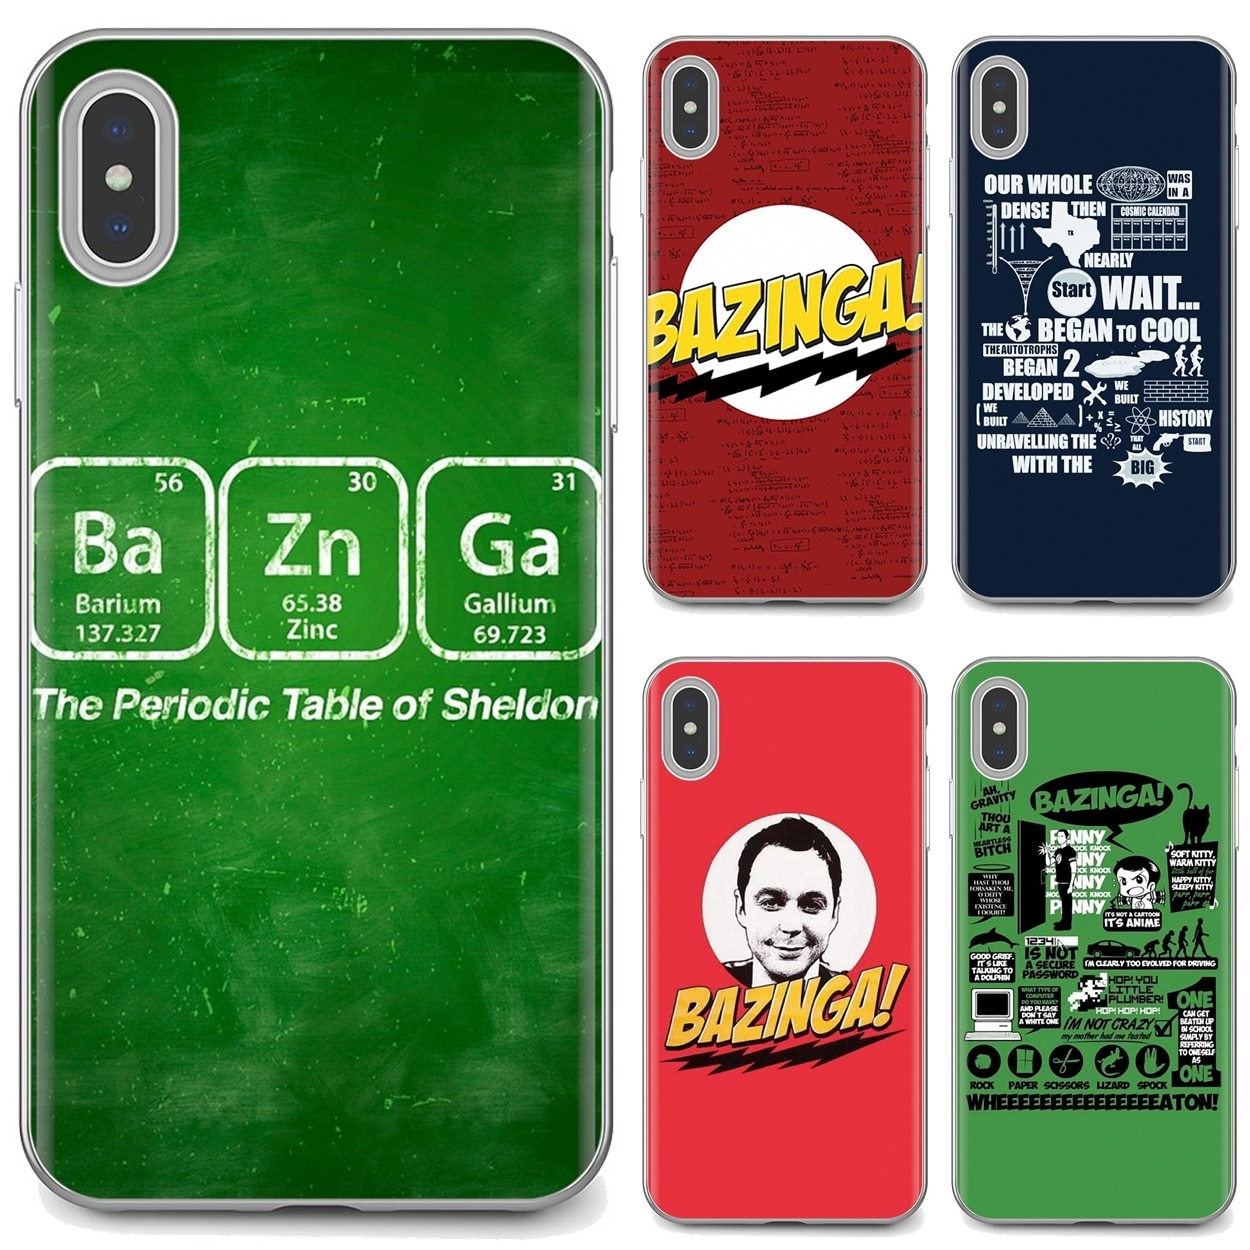 Soft TPU Case For iPhone 11 Pro 4 4S 5 5S SE 5C 6 6S 7 8 X 10 XR XS Plus Max For iPod Touch Bazinga The Big Bang Theory tv show